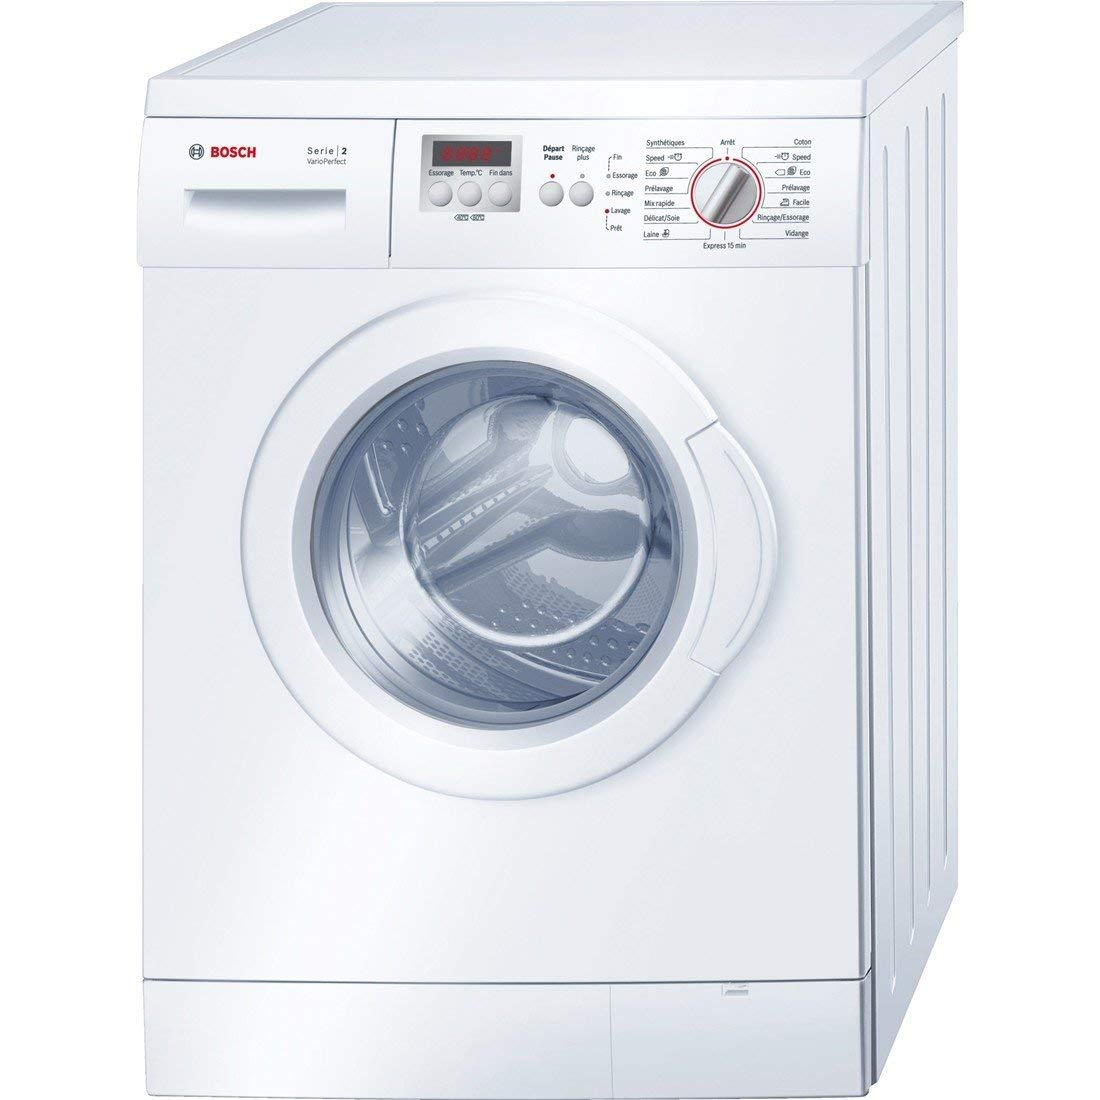 Choisir une machine à laver Bosch